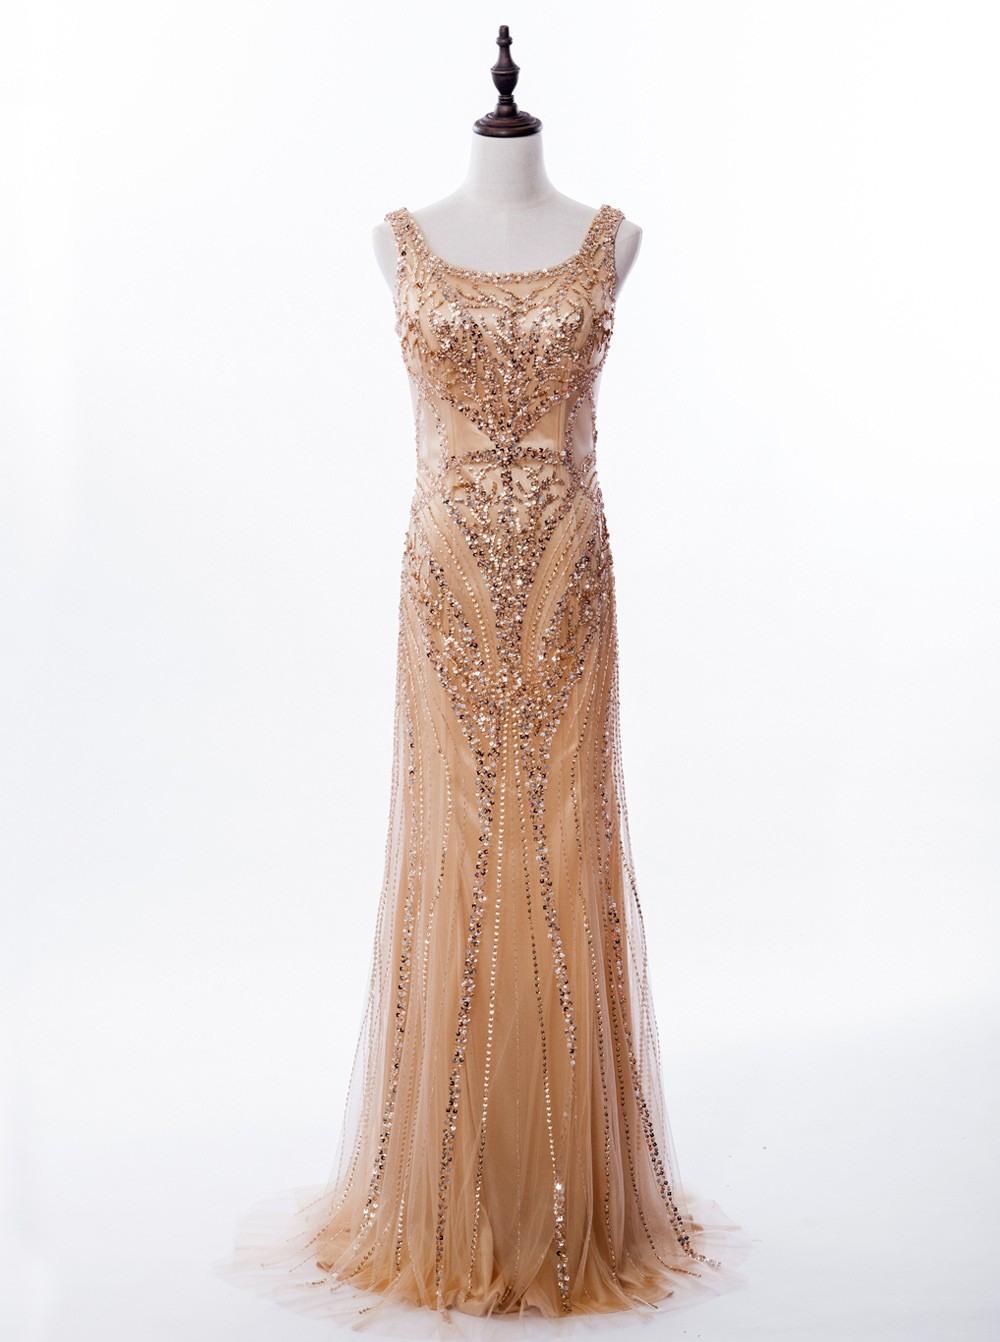 20 Luxus Abendkleid Pailetten Stylish20 Großartig Abendkleid Pailetten Vertrieb